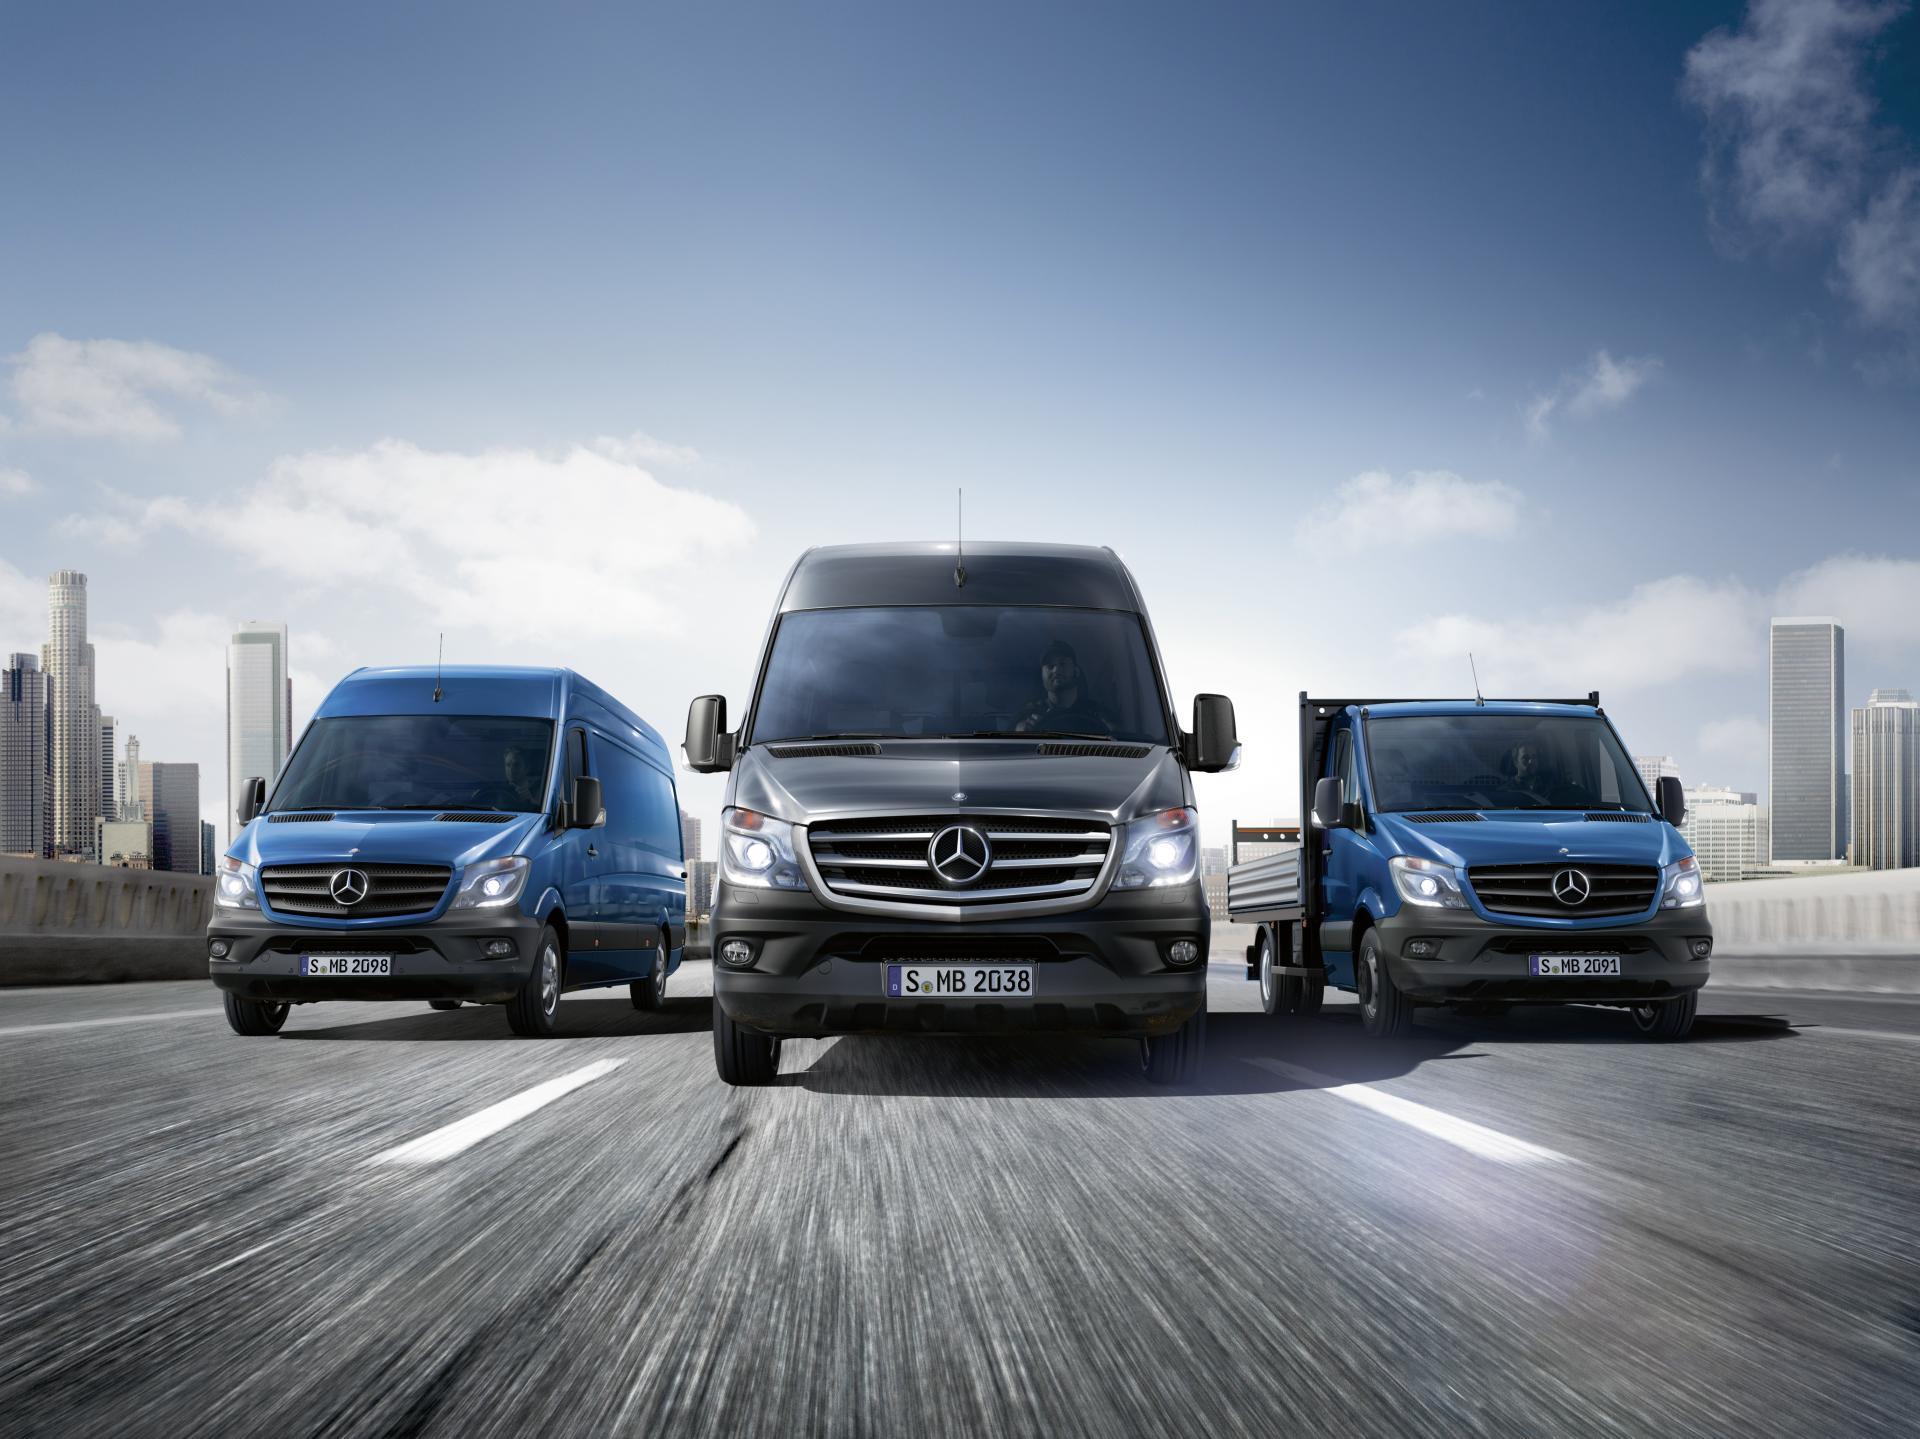 2014 mercedes benz sprinter wallpaper for Mercedes benz commercial van